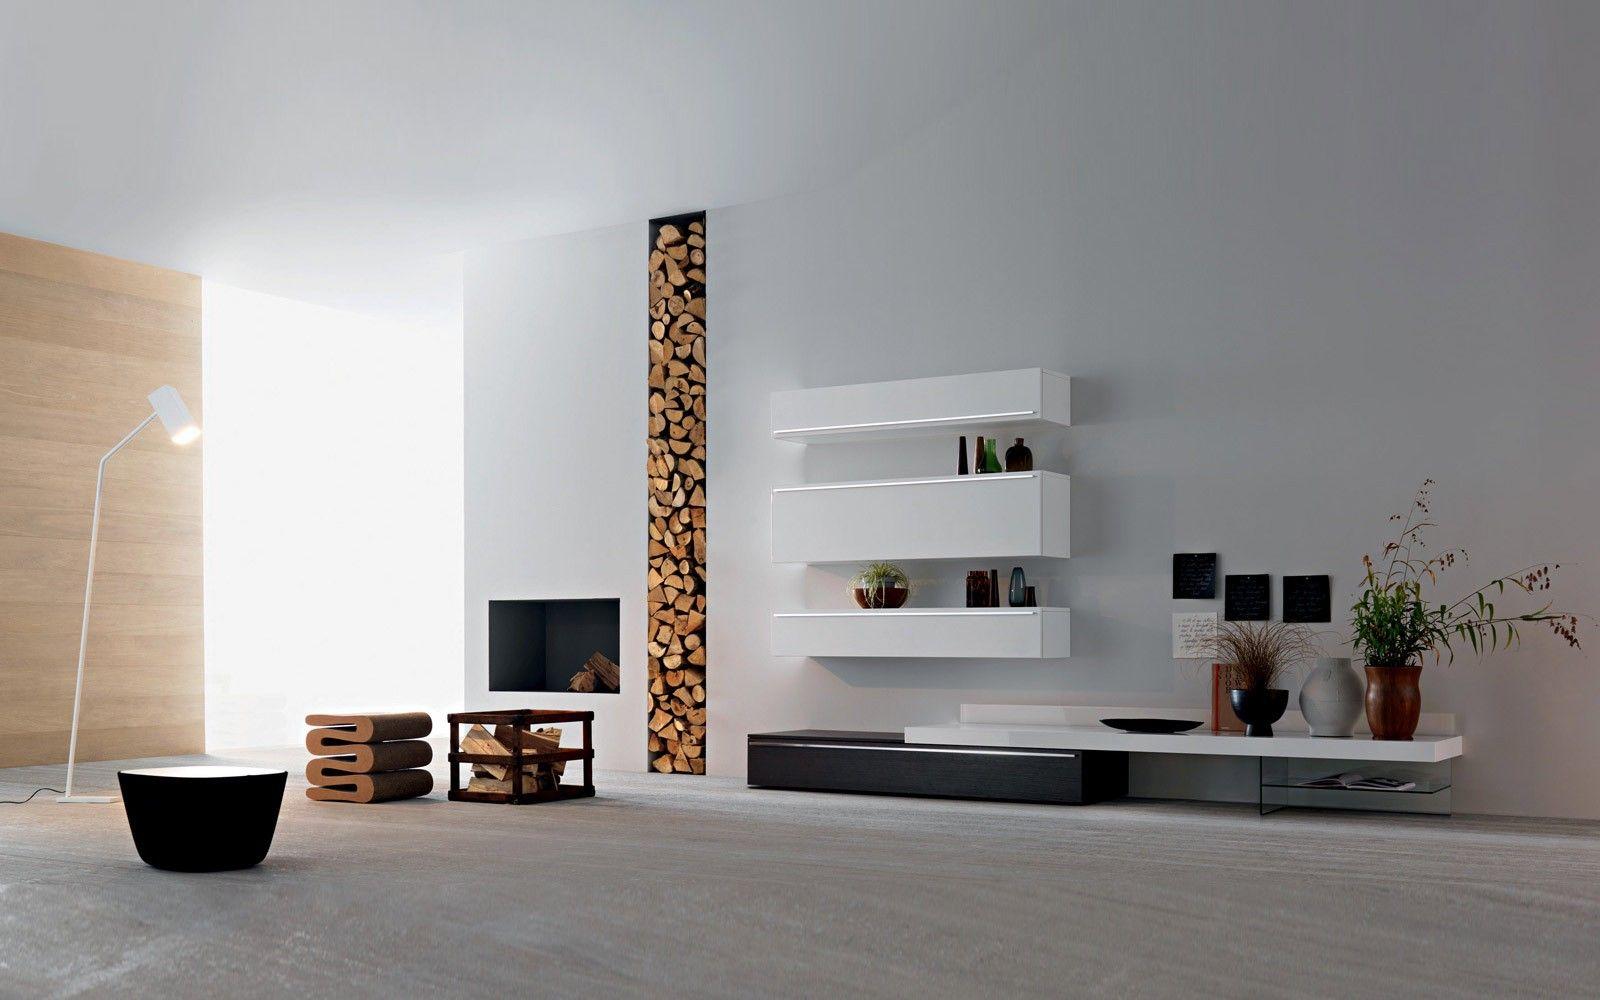 Tv wand design  Die besten 25+ Tv wand lampo Ideen nur auf Pinterest | Tv wand do ...